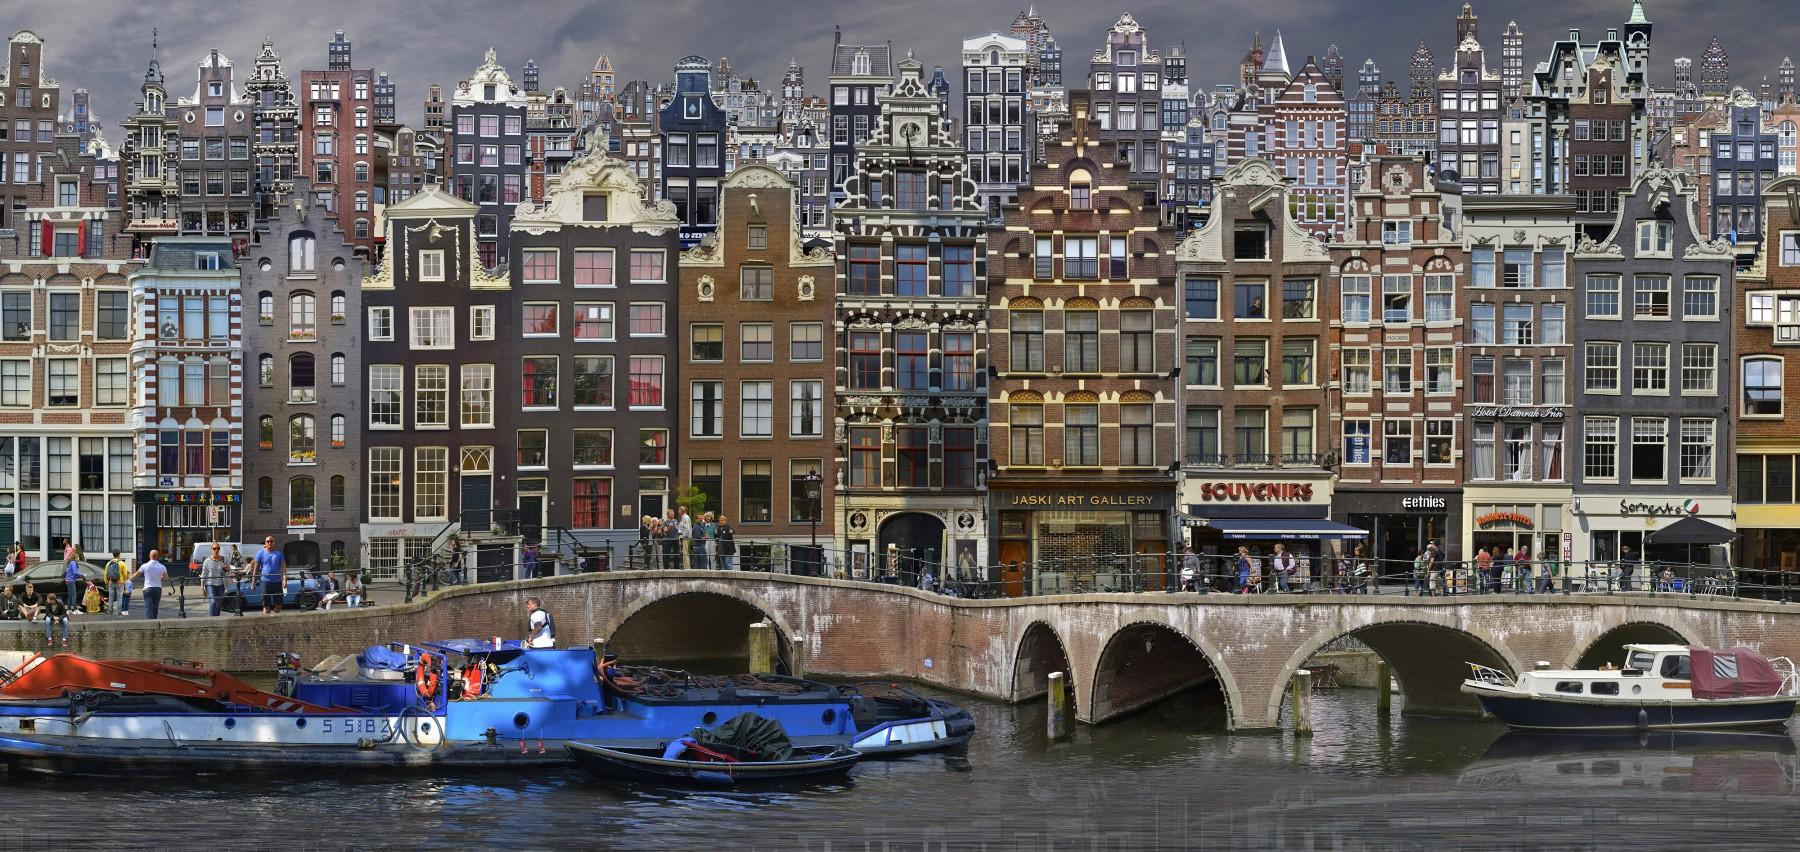 Balade-dAmsterdam-2